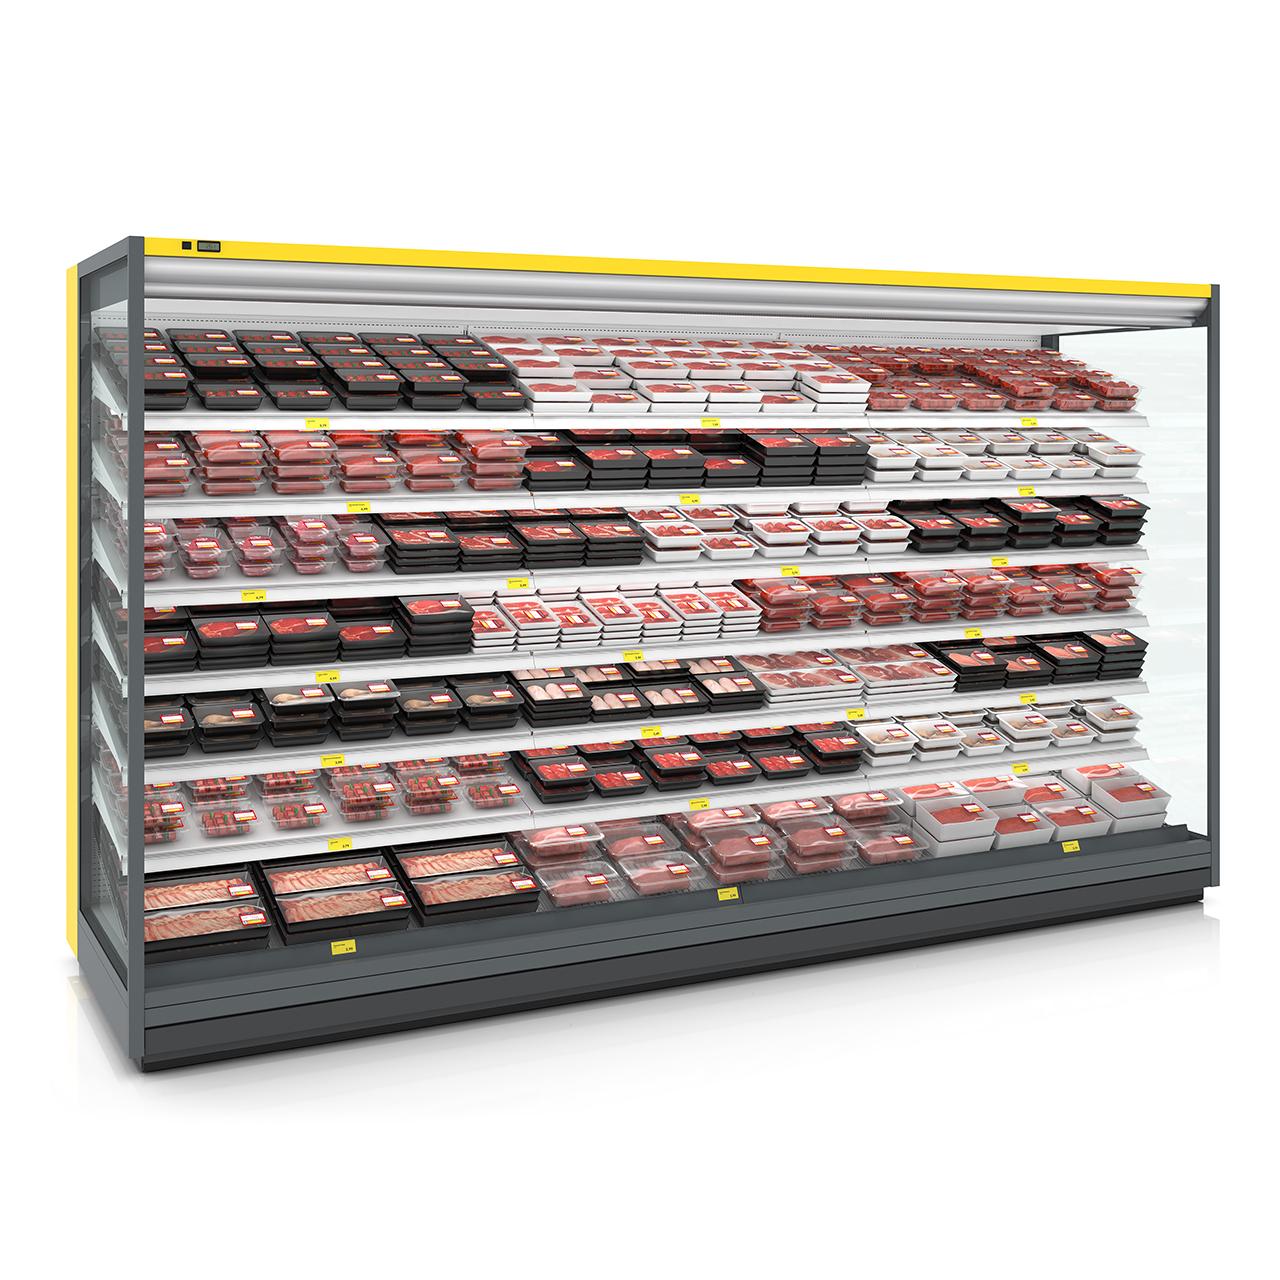 refrigerated-multideck-e6-monaxis-ulf-C